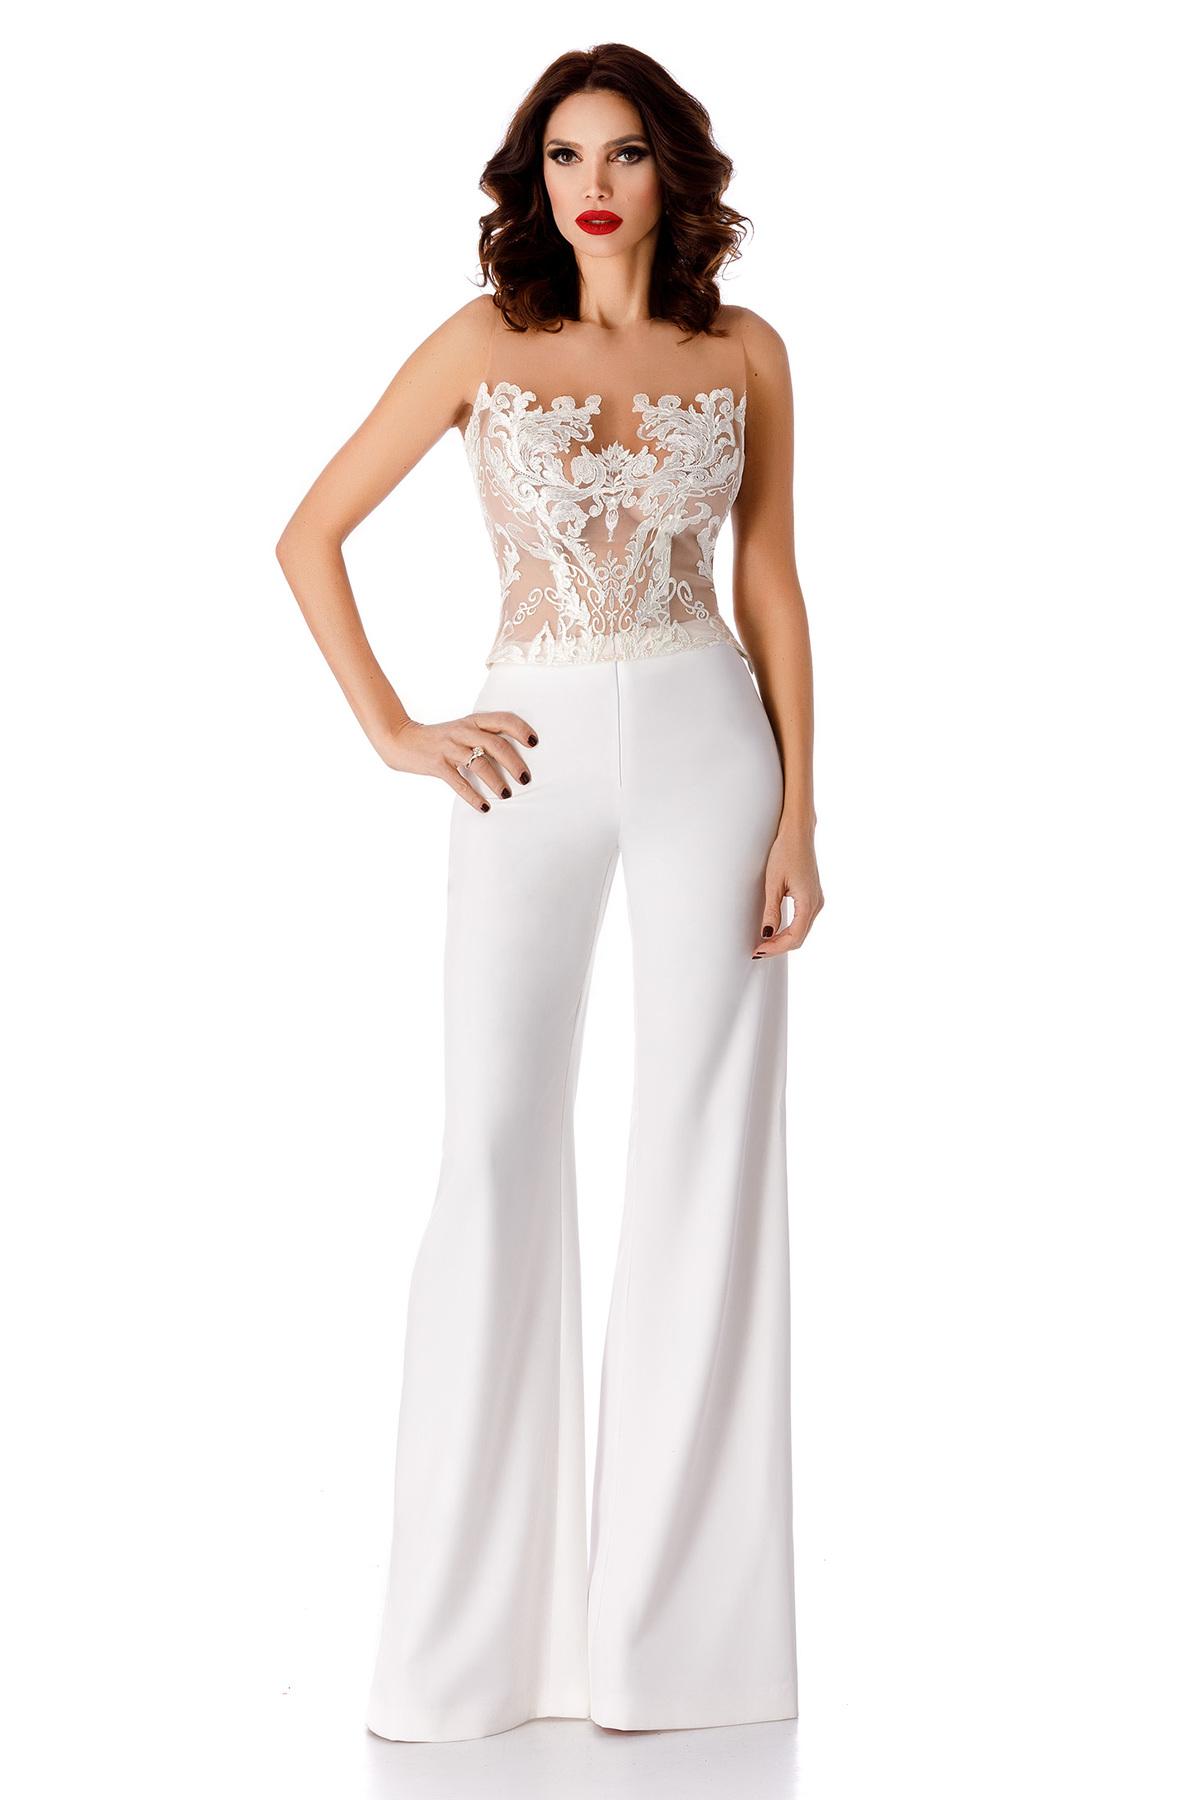 Pantaloni albe eleganti cu talie inalta evazati din stofa subtire usor elastica